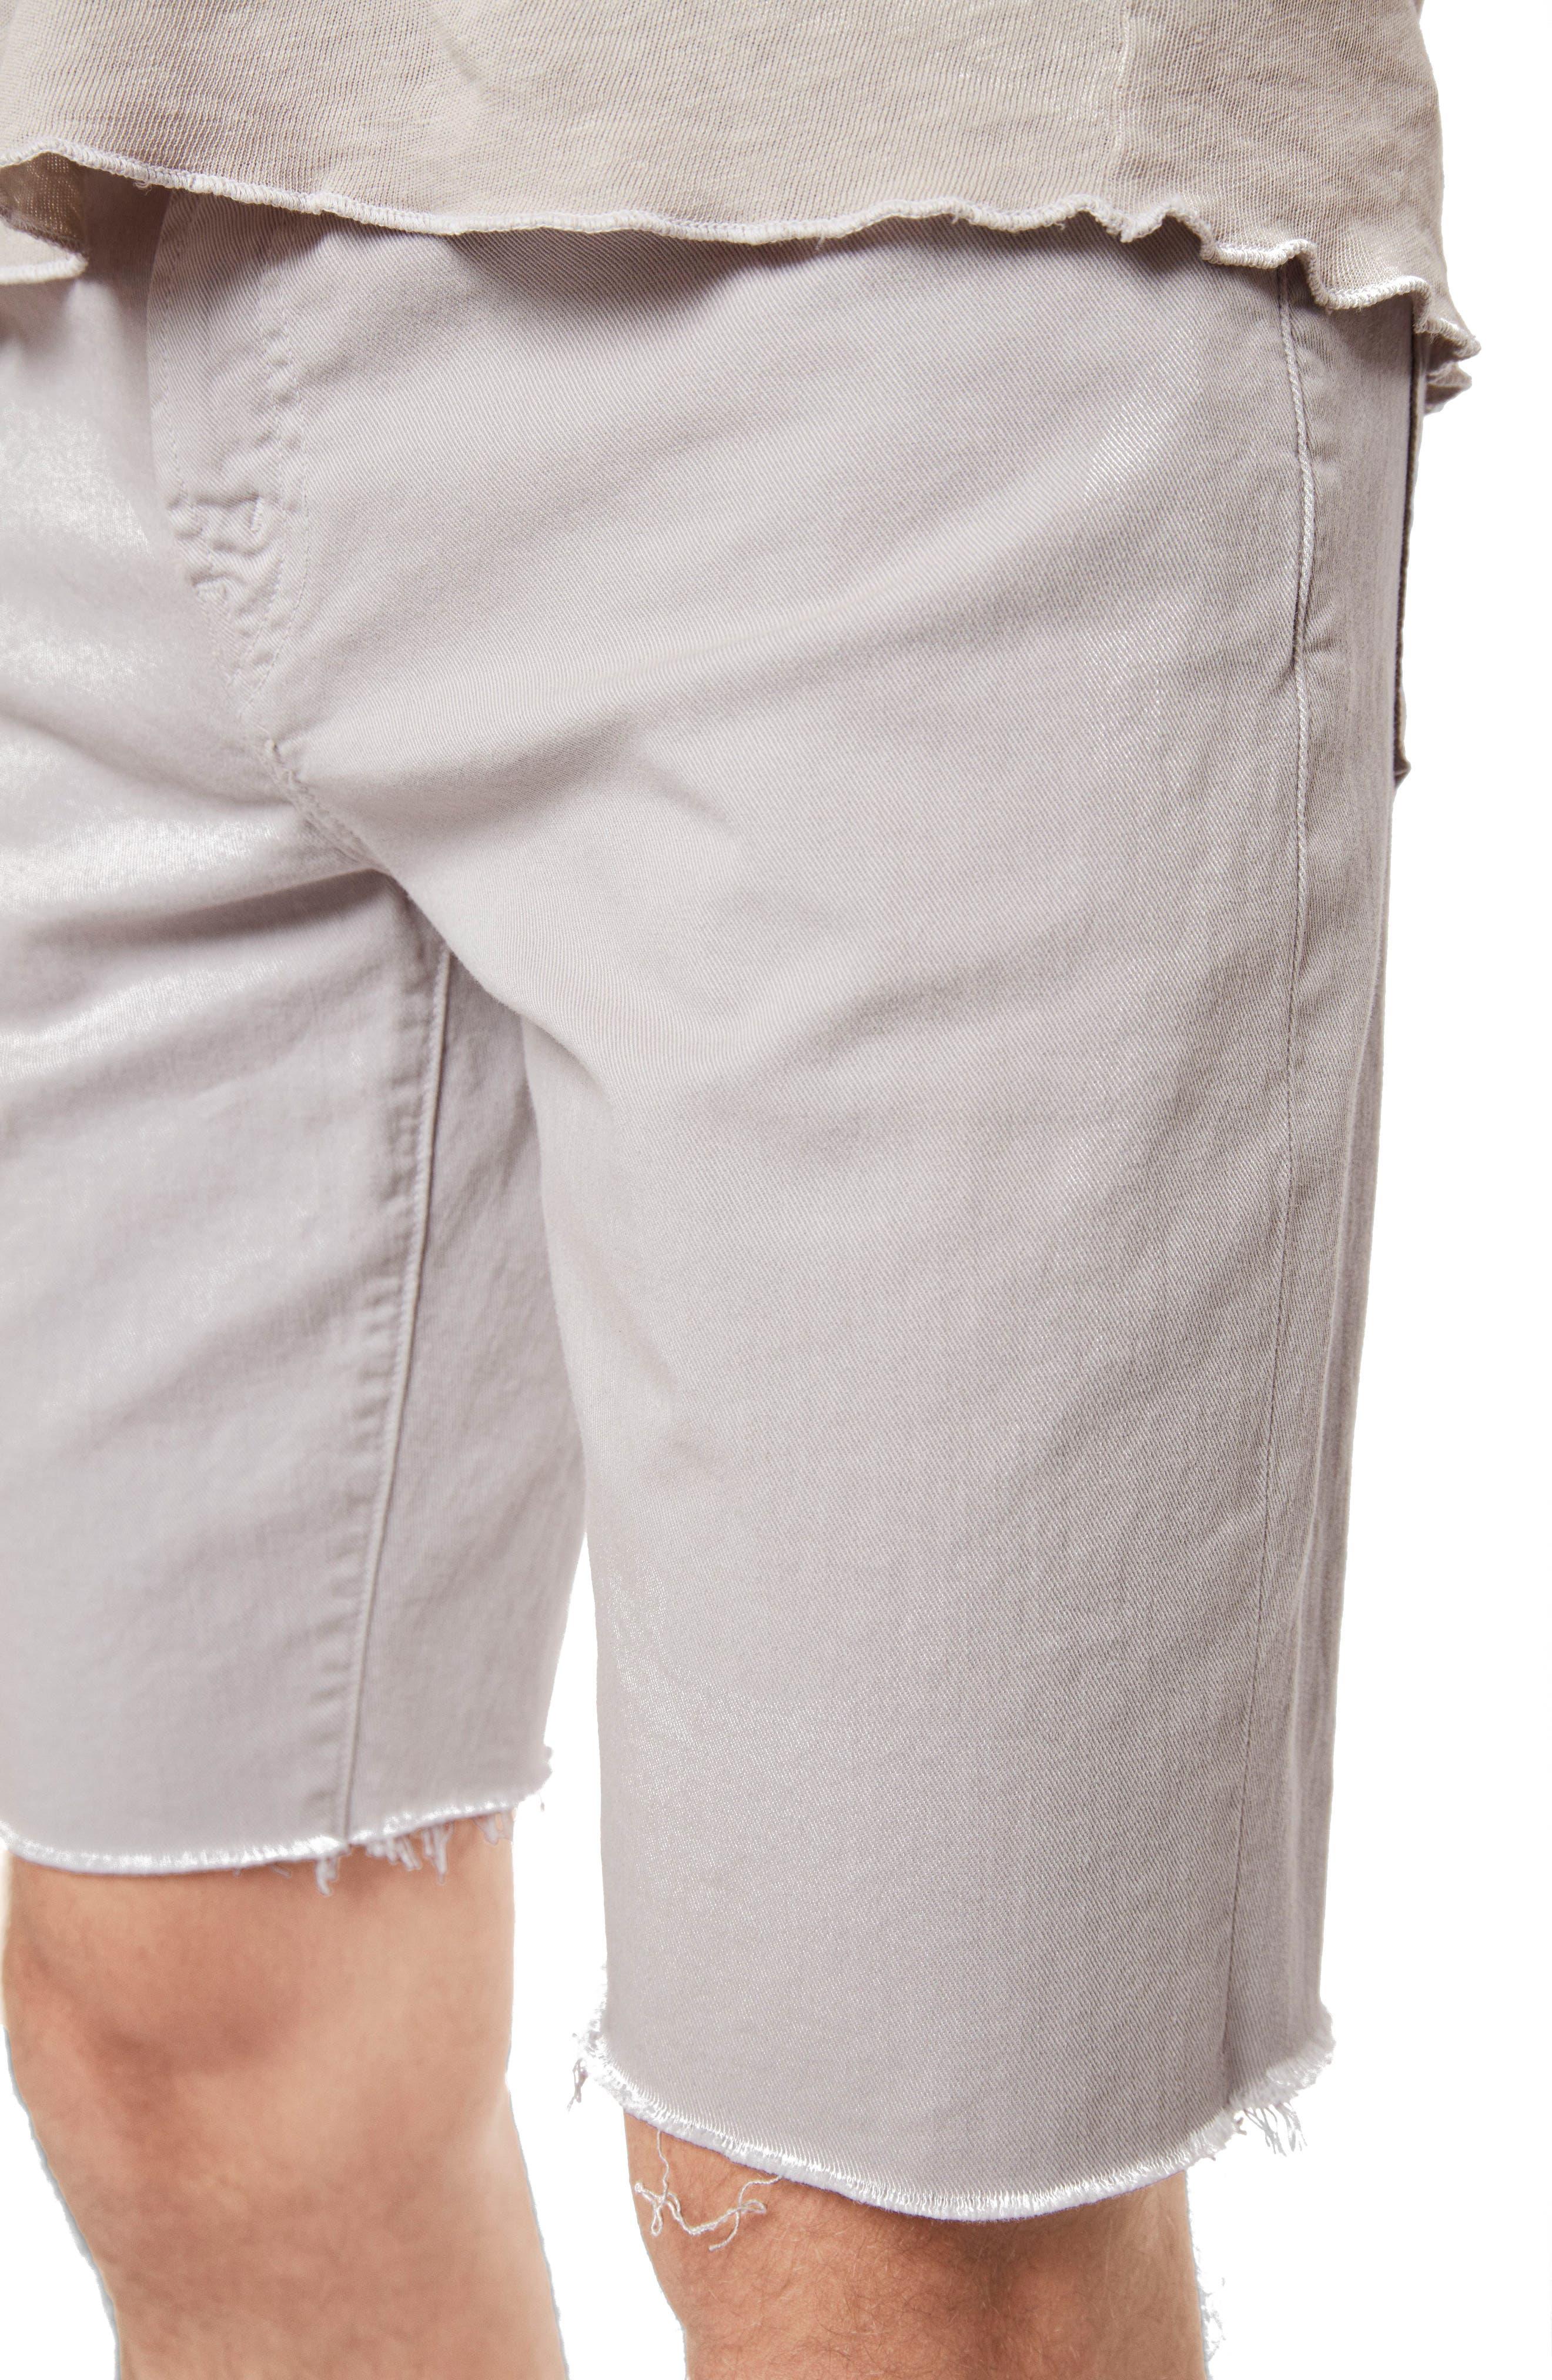 Eli Cutoff Denim Shorts,                             Alternate thumbnail 4, color,                             Reflect